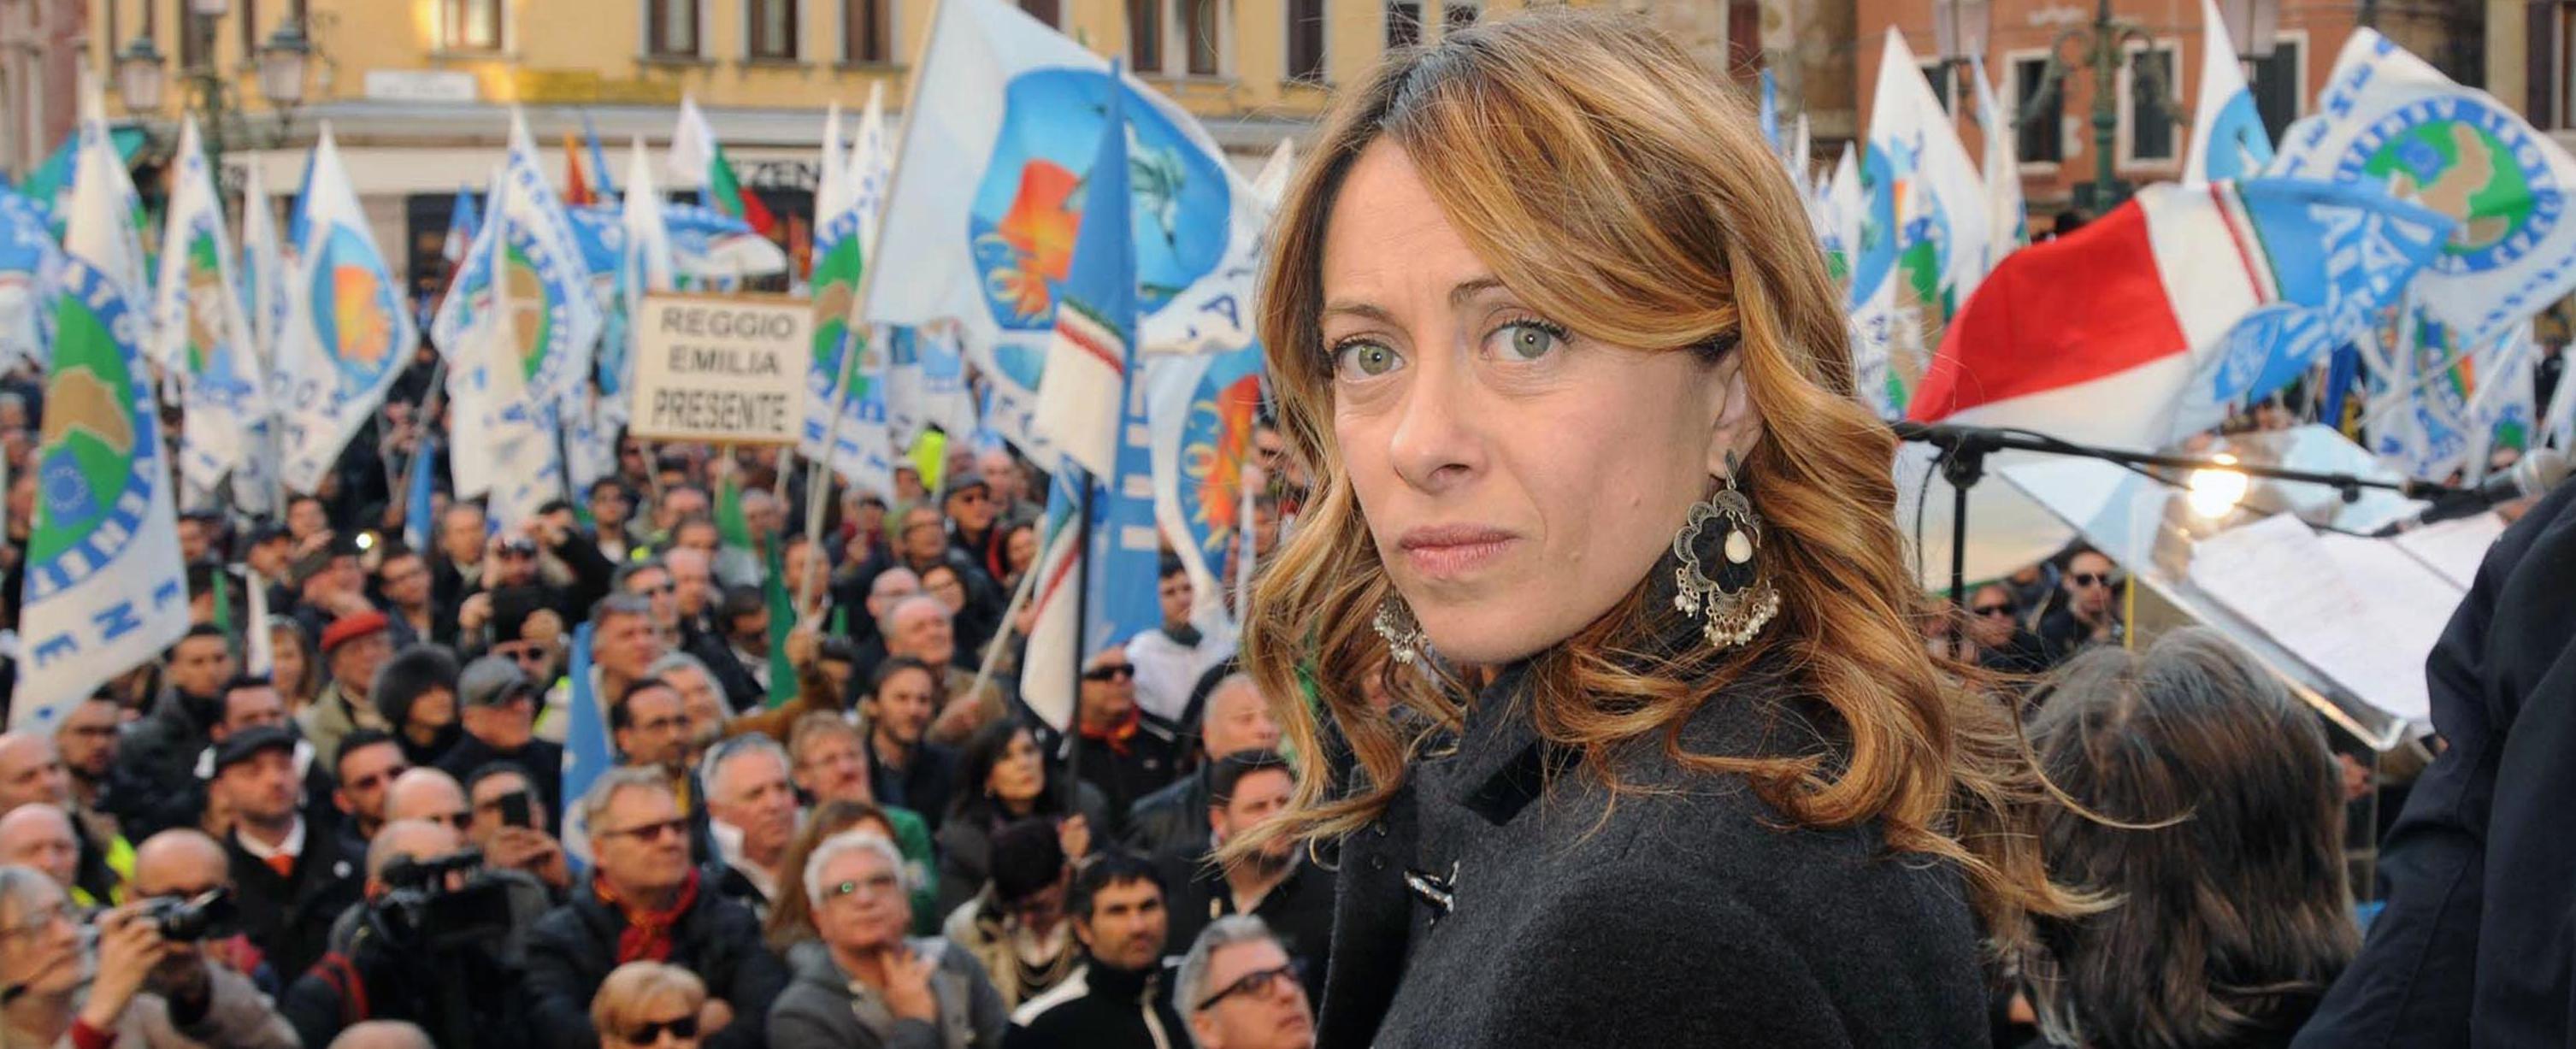 Giorgia Meloni a Venezia